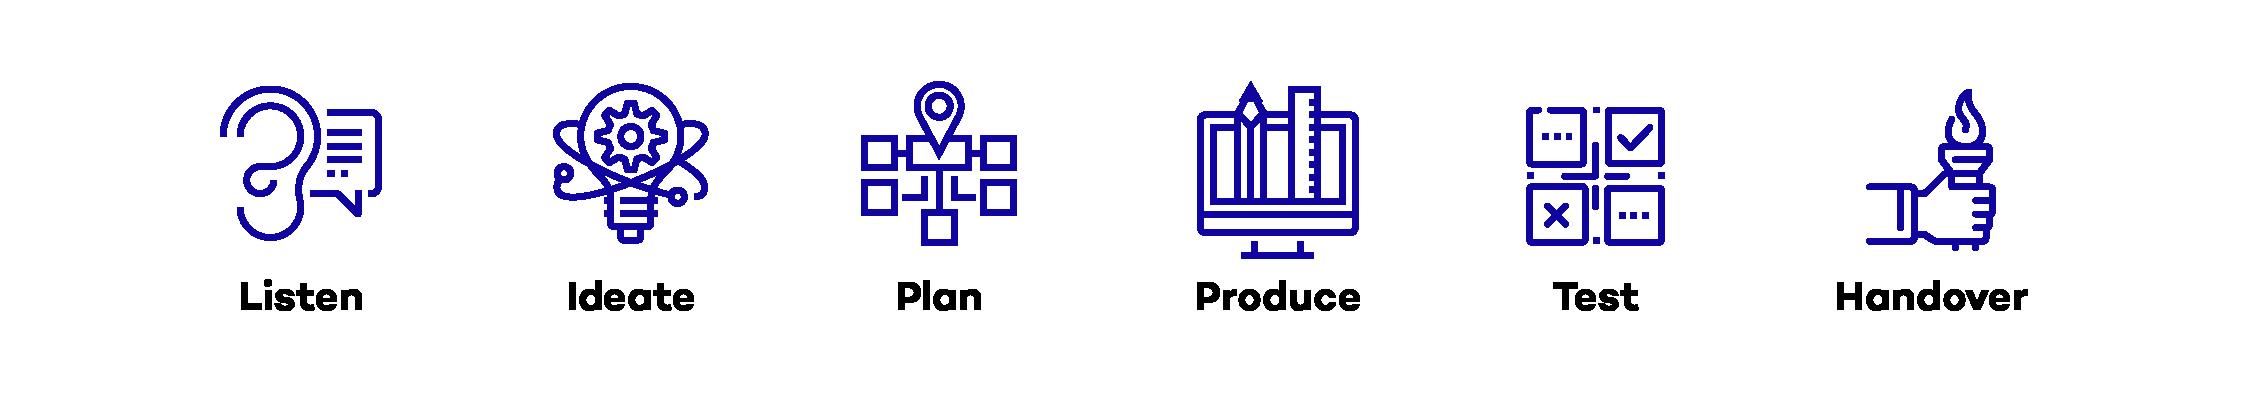 ProcessIntro.png